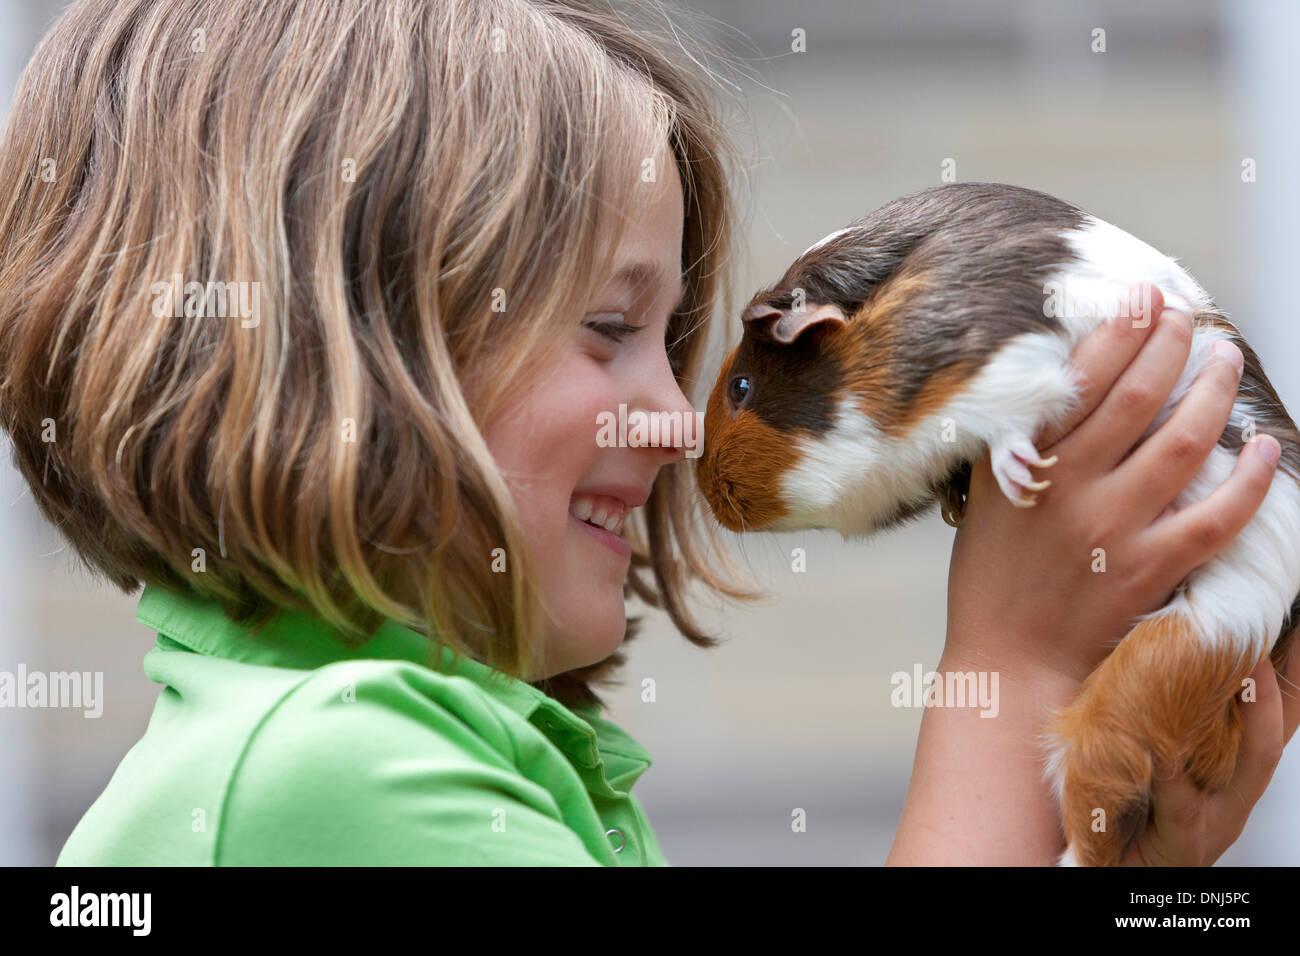 Girl Kiss Pig